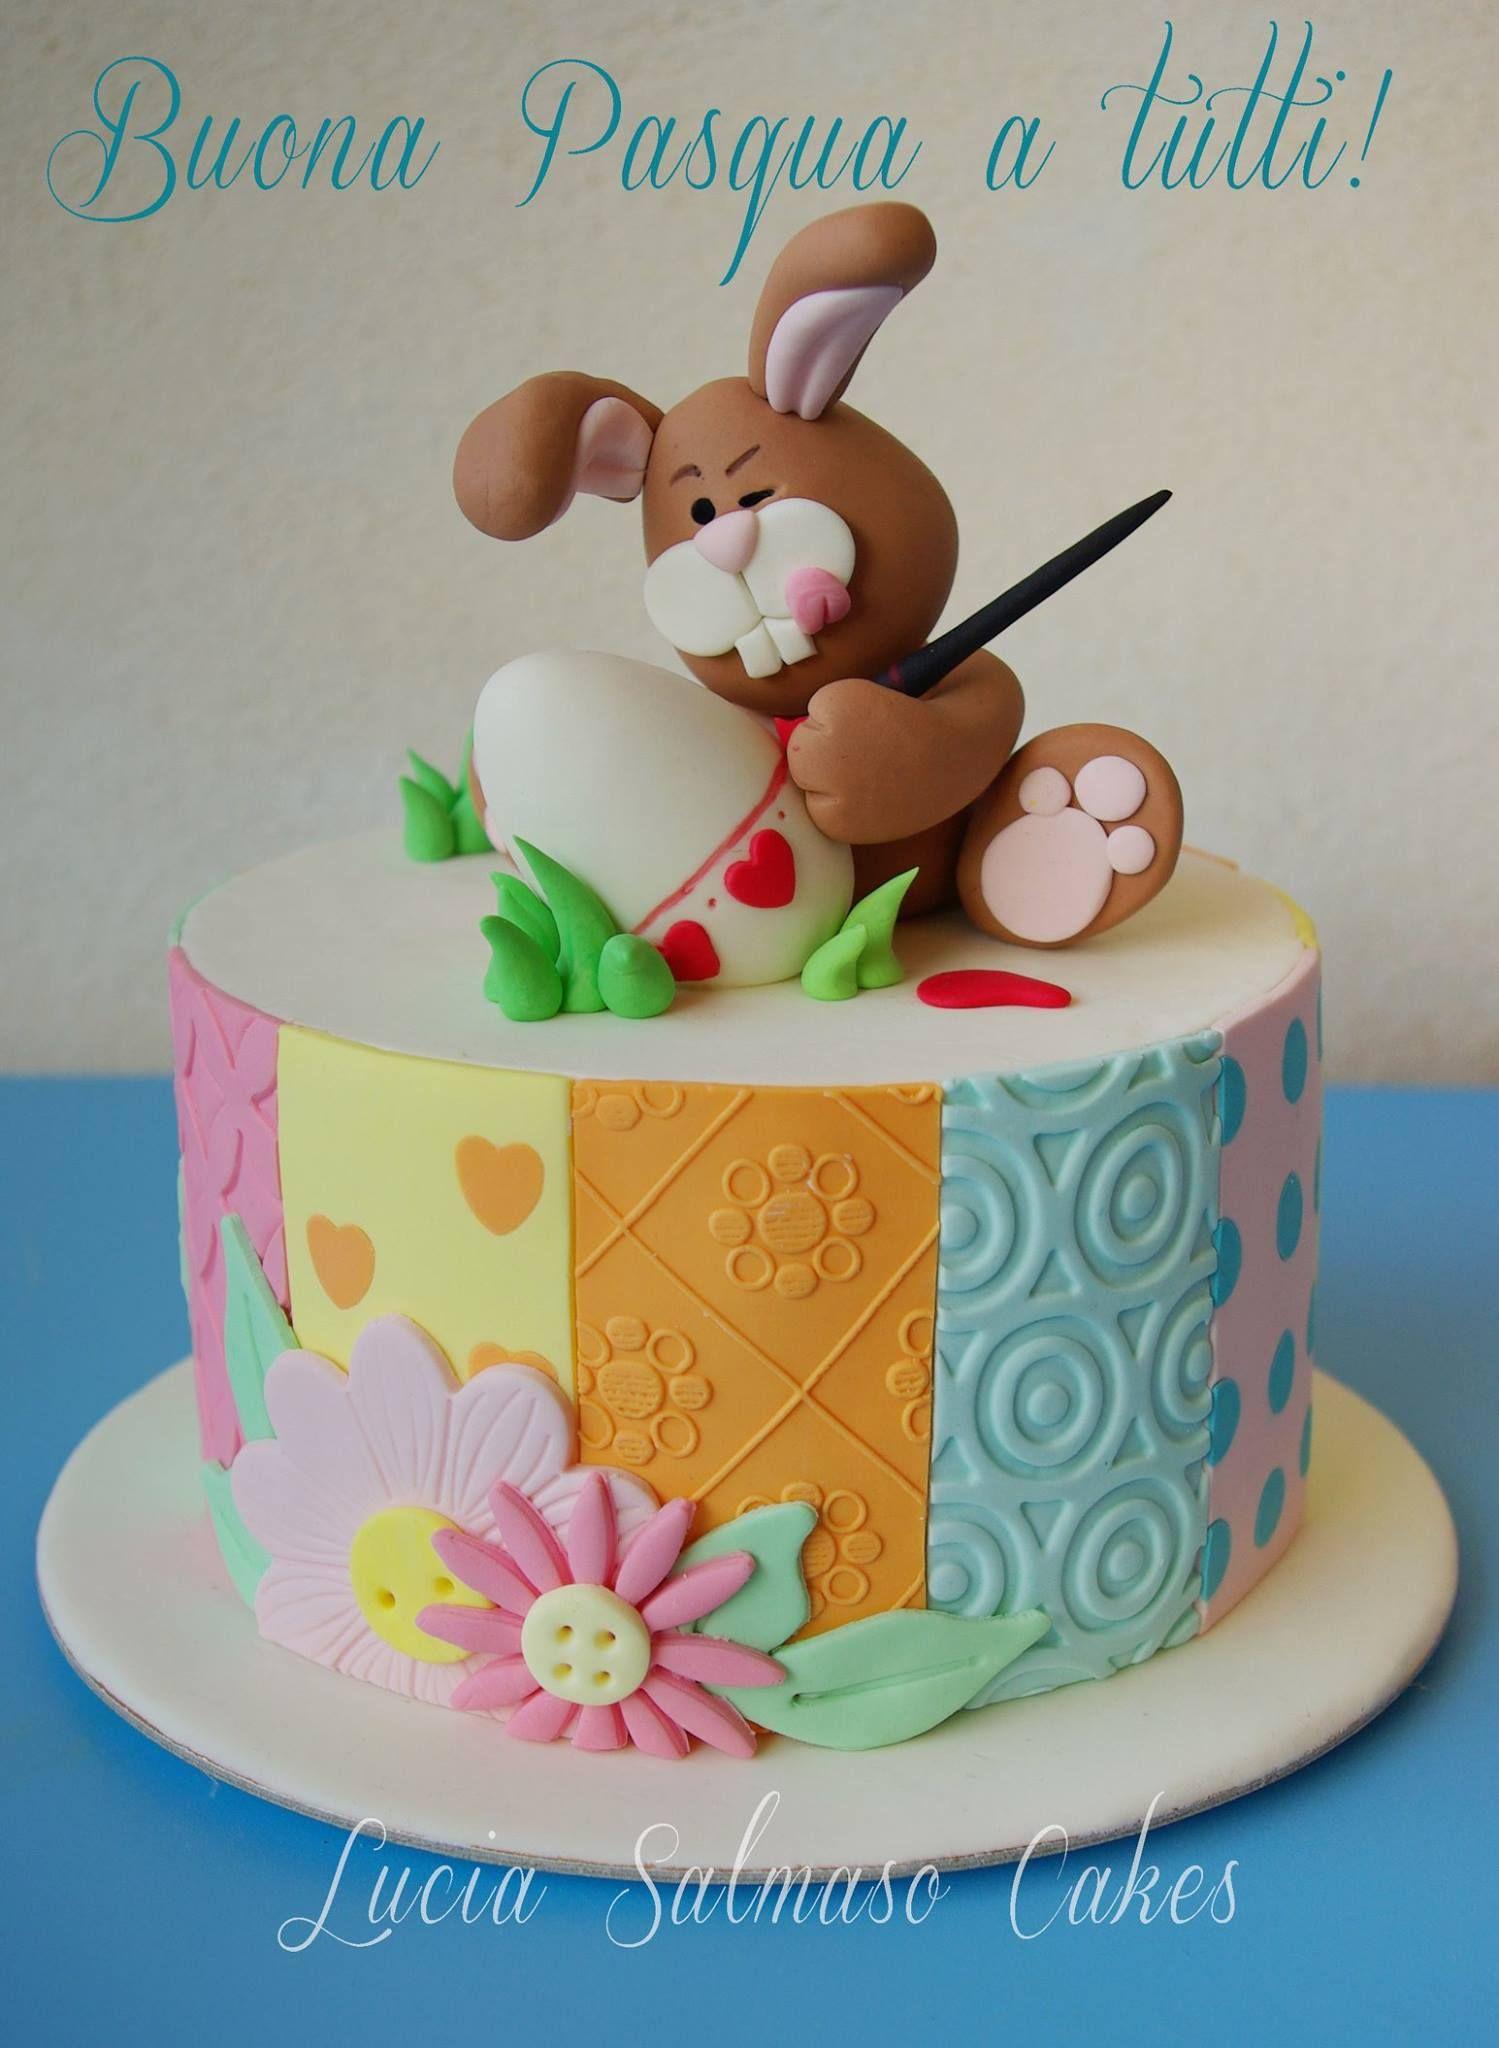 Bunny Cake Lucia Salmaso Ostern Kuchen Ostern Backen Festtagstorten